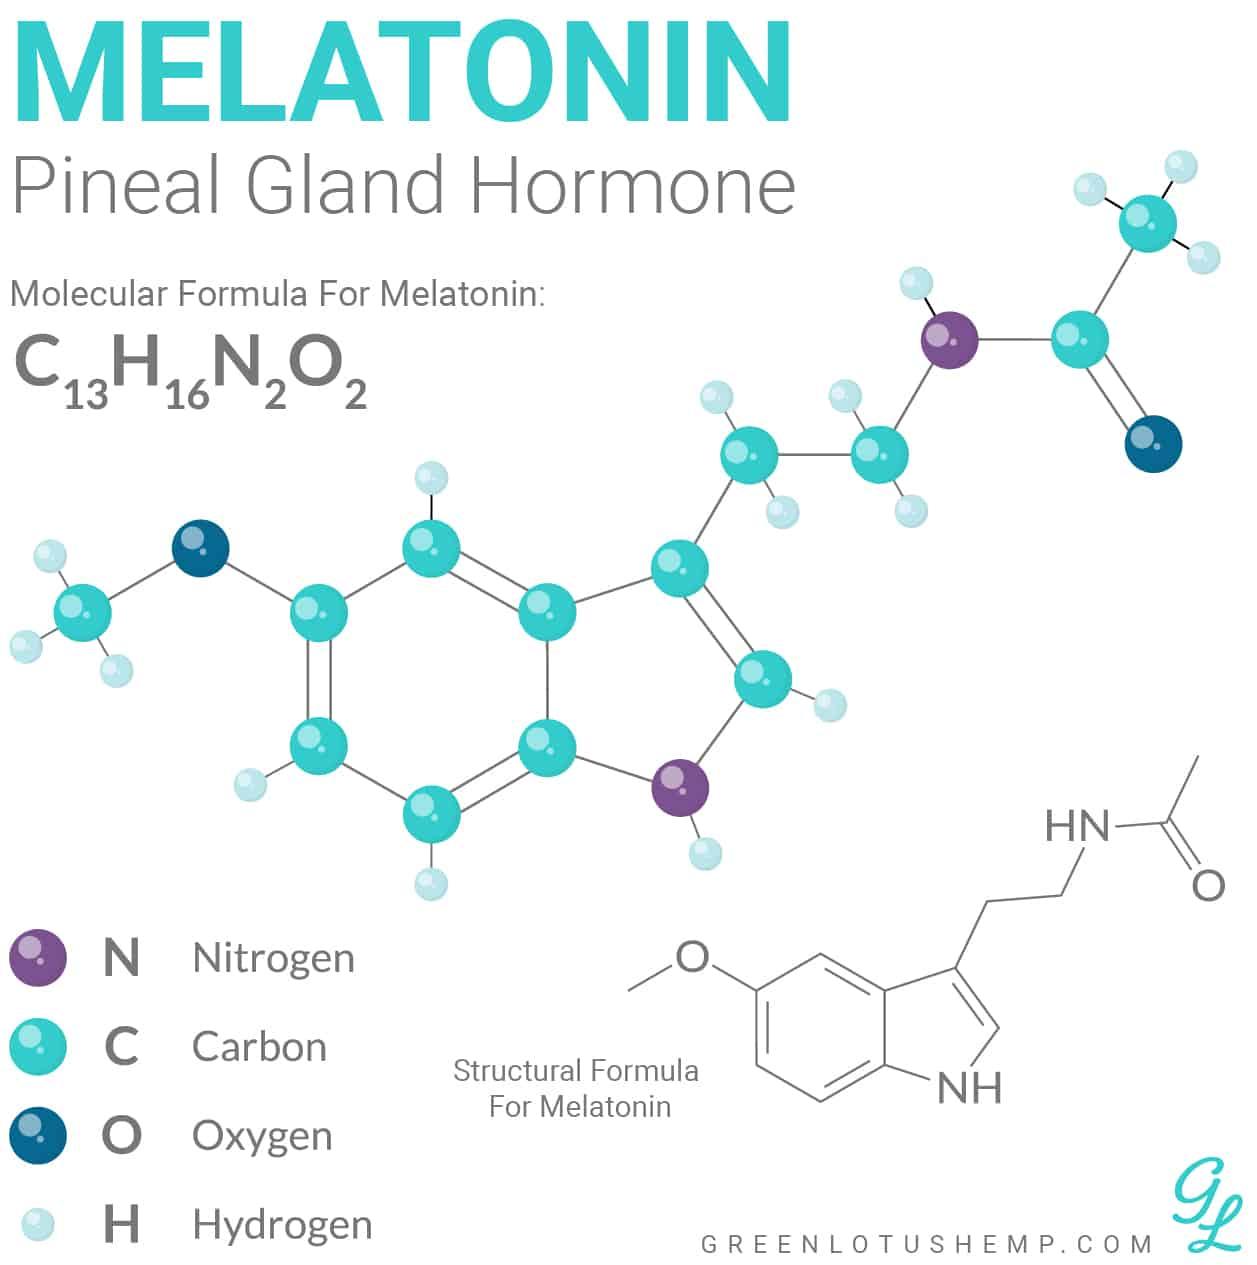 Melatonin Pineal Gland Hormone